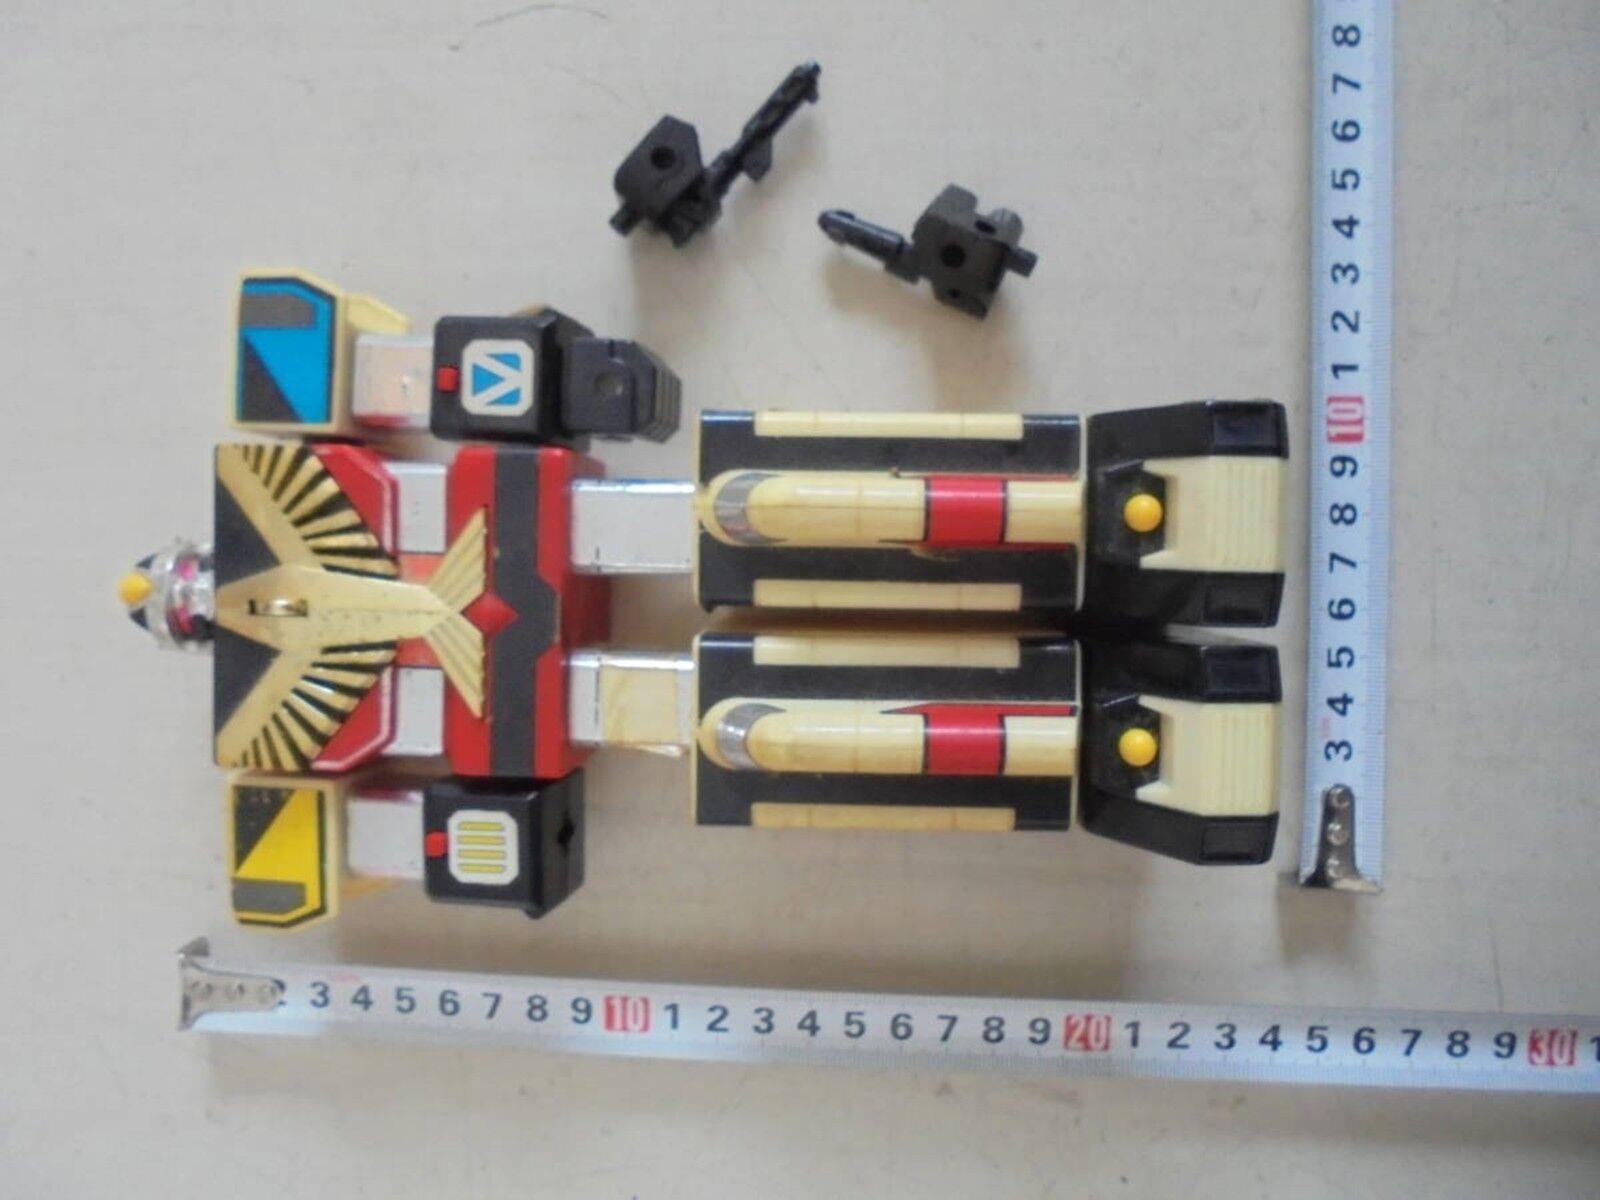 DX Jet Jet Jet Icarus Bandai Power Rangers Jetman Megazord sky coalesced Chogokin USED da3849